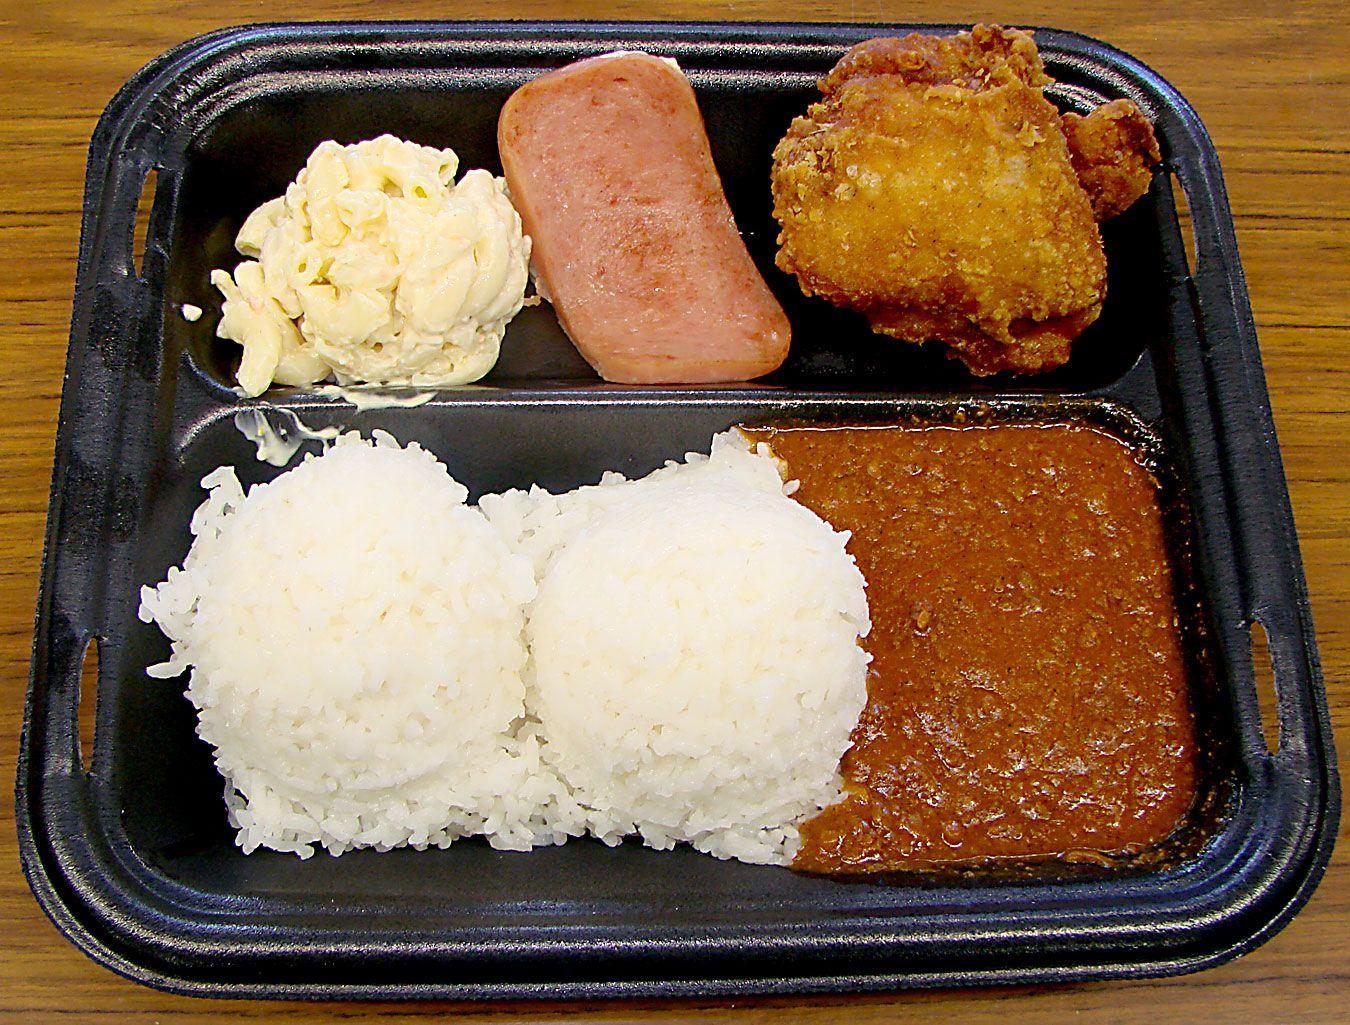 Kaukau time kaukau is a hawaiian pidgin slang word meaning food kaukau is a hawaiian pidgin slang word meaning food or to eat zippys chili recipe forumfinder Image collections